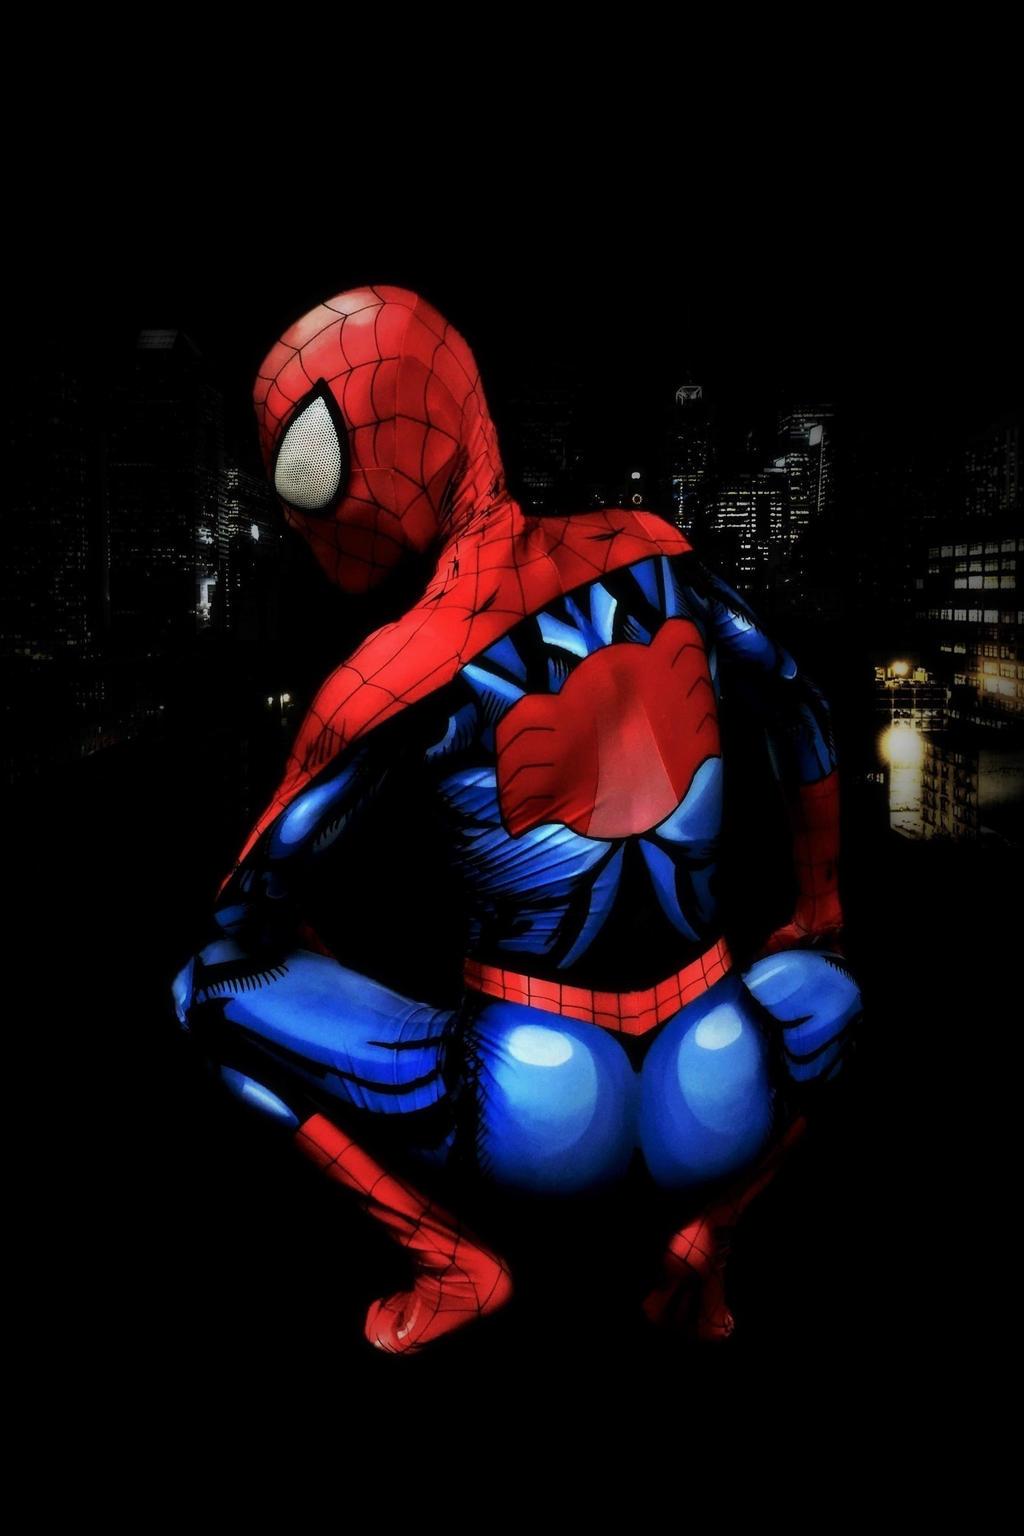 ultimate spiderman powerman - photo #28